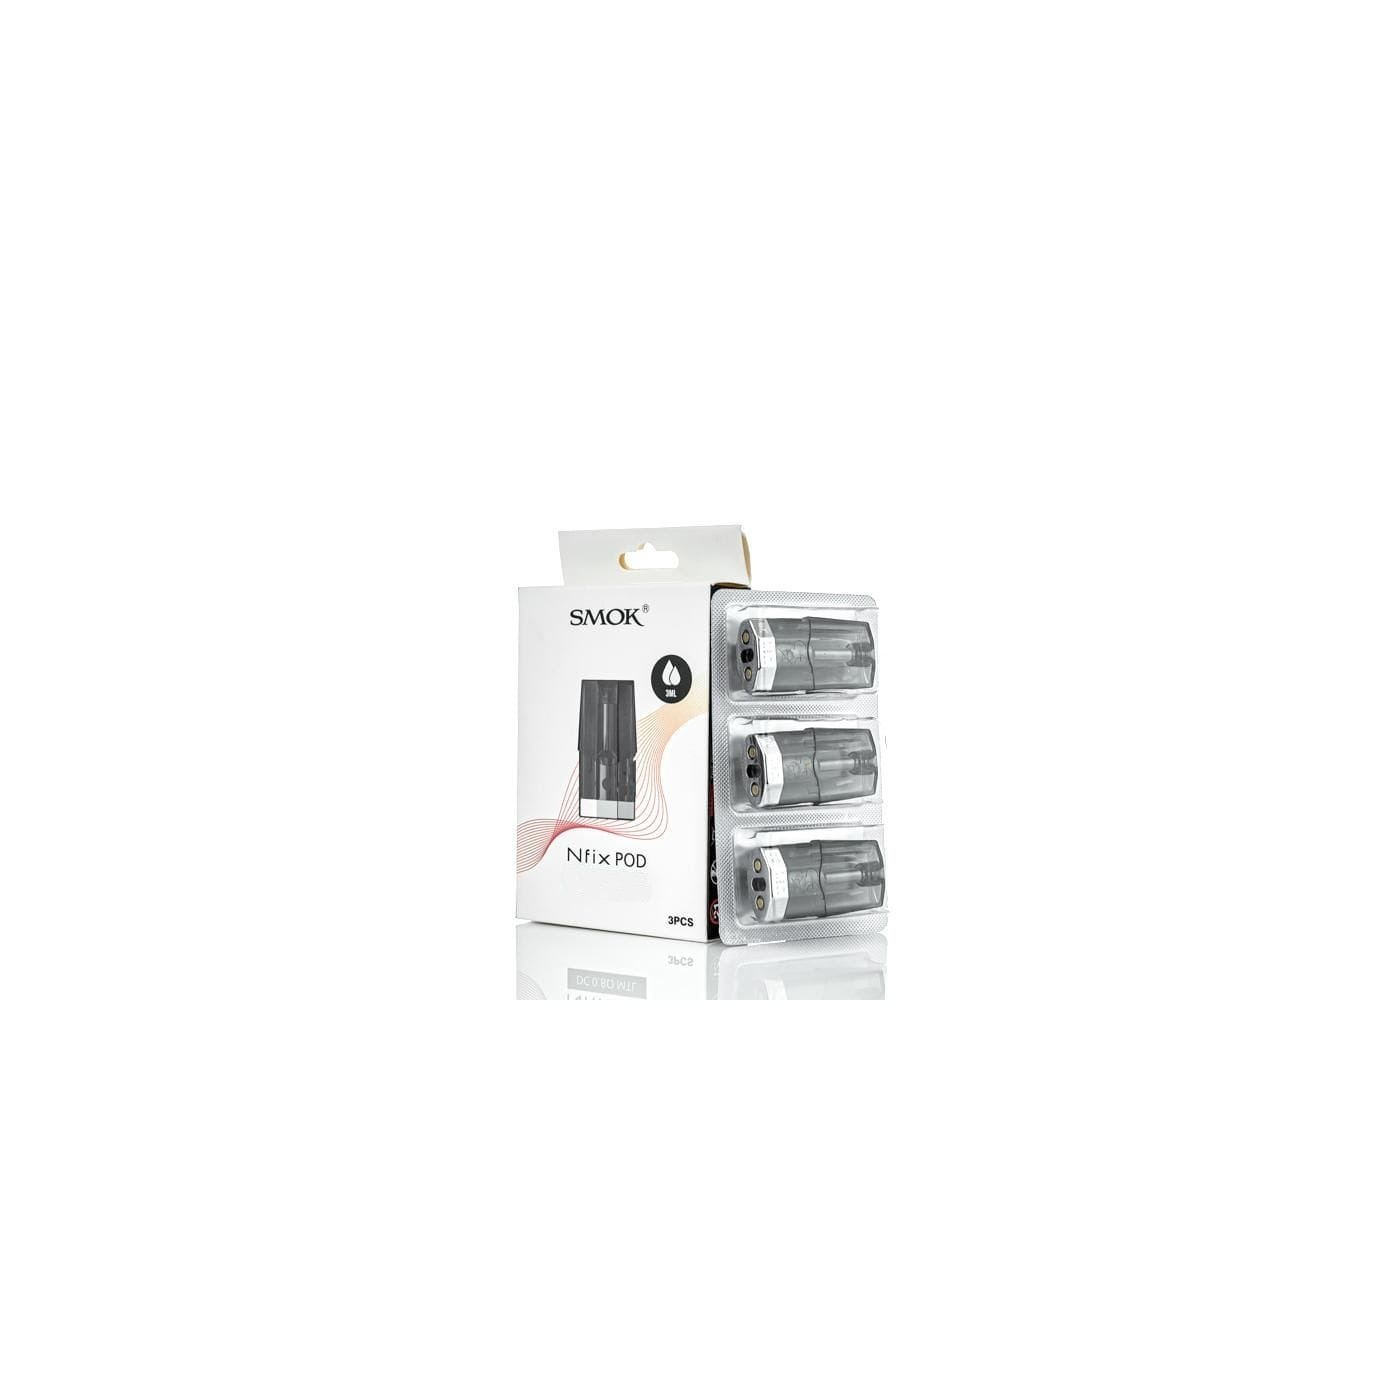 Smok NFIX SC MTL Pod - 1.0 ohm - 3 Pack